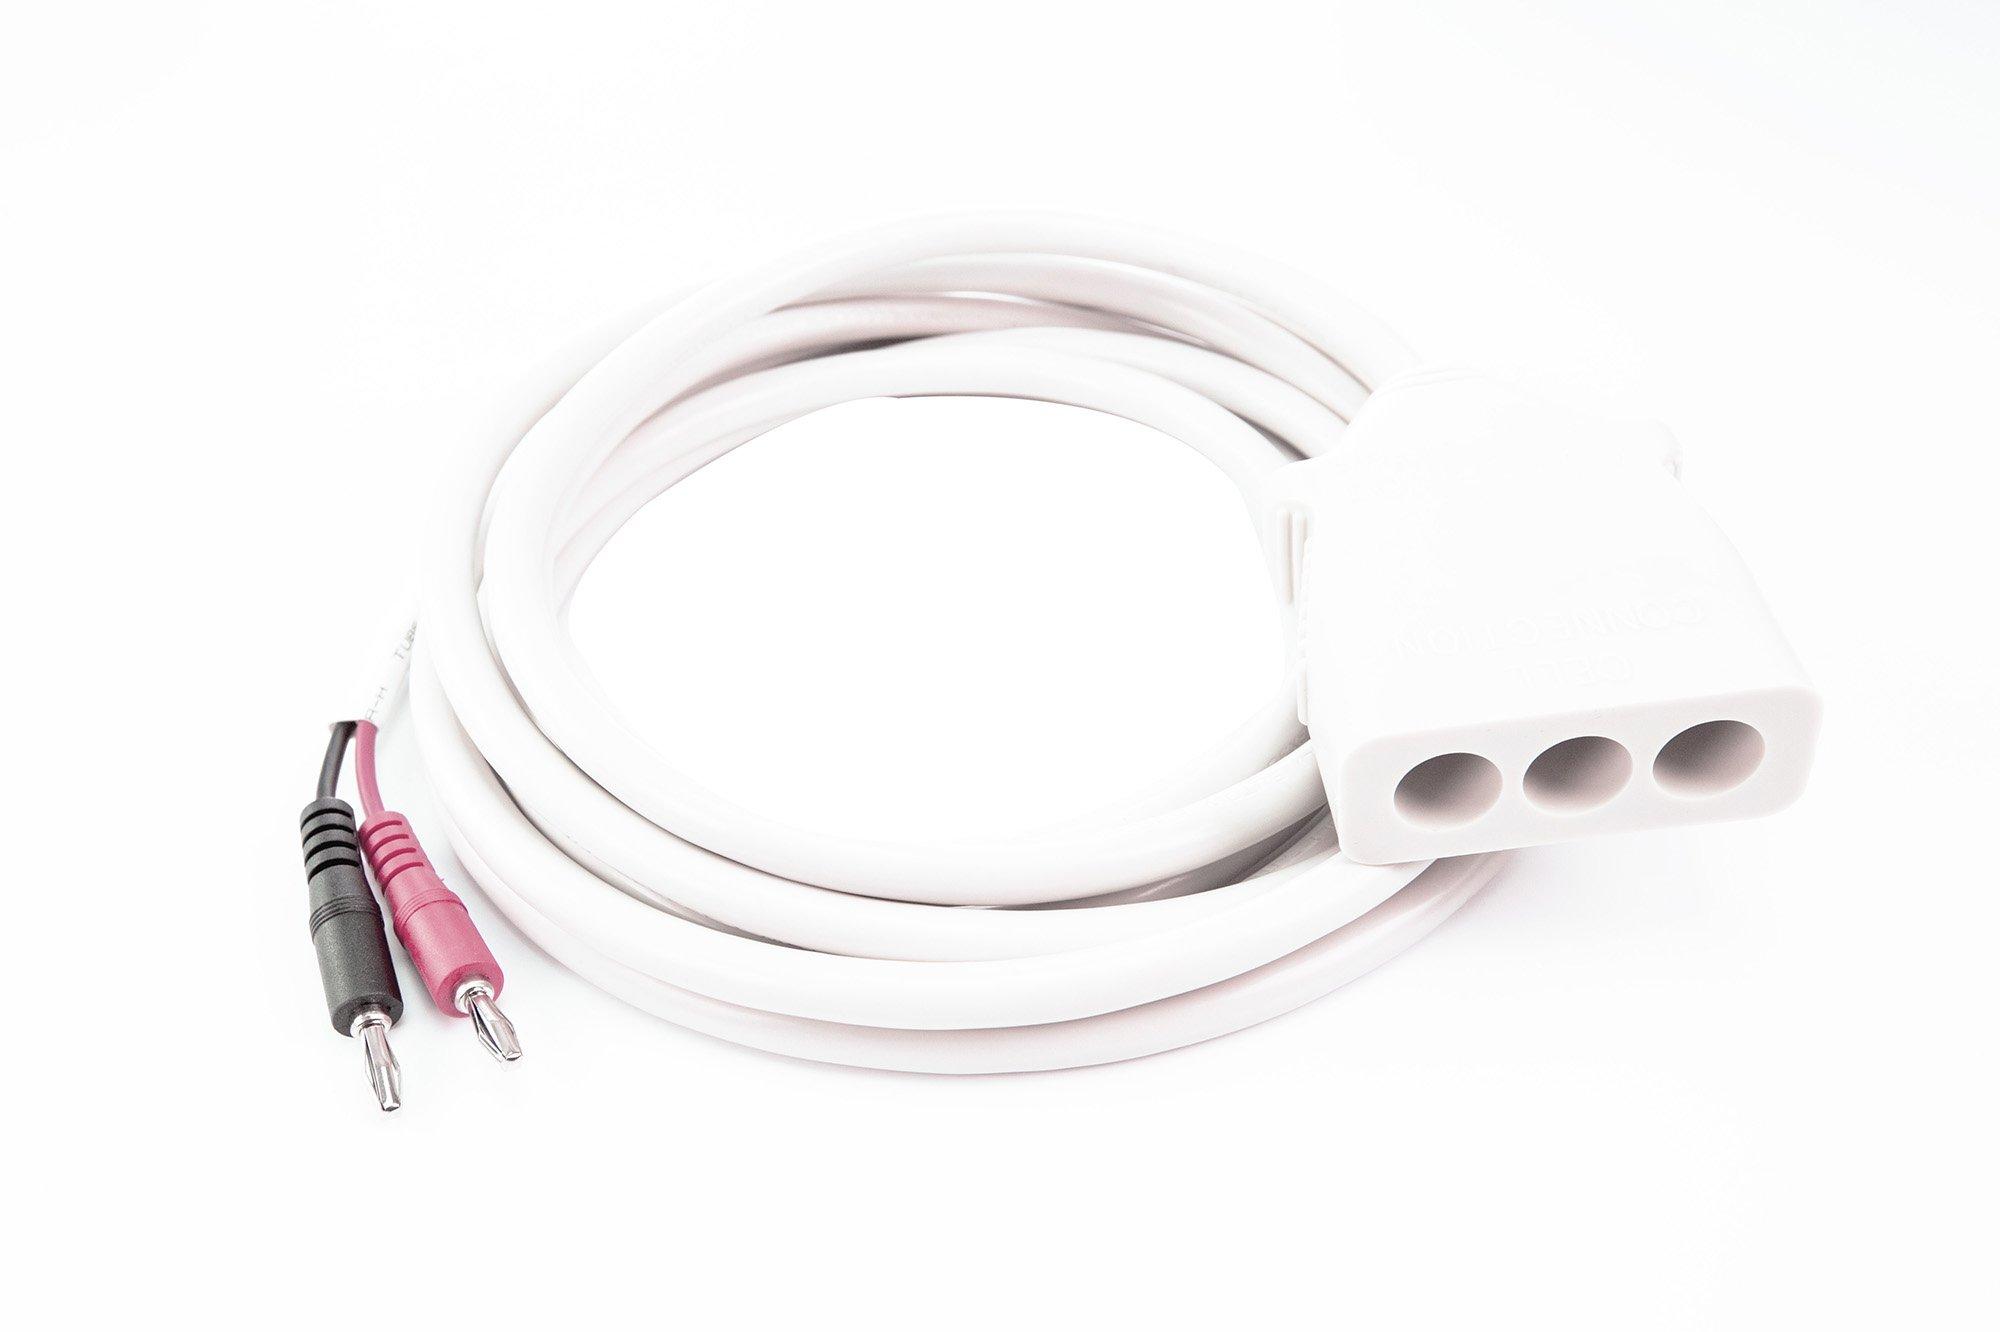 Cell Cord for Auto Pilot Salt Chlorinator 952-ST/DIG by AutoPilot